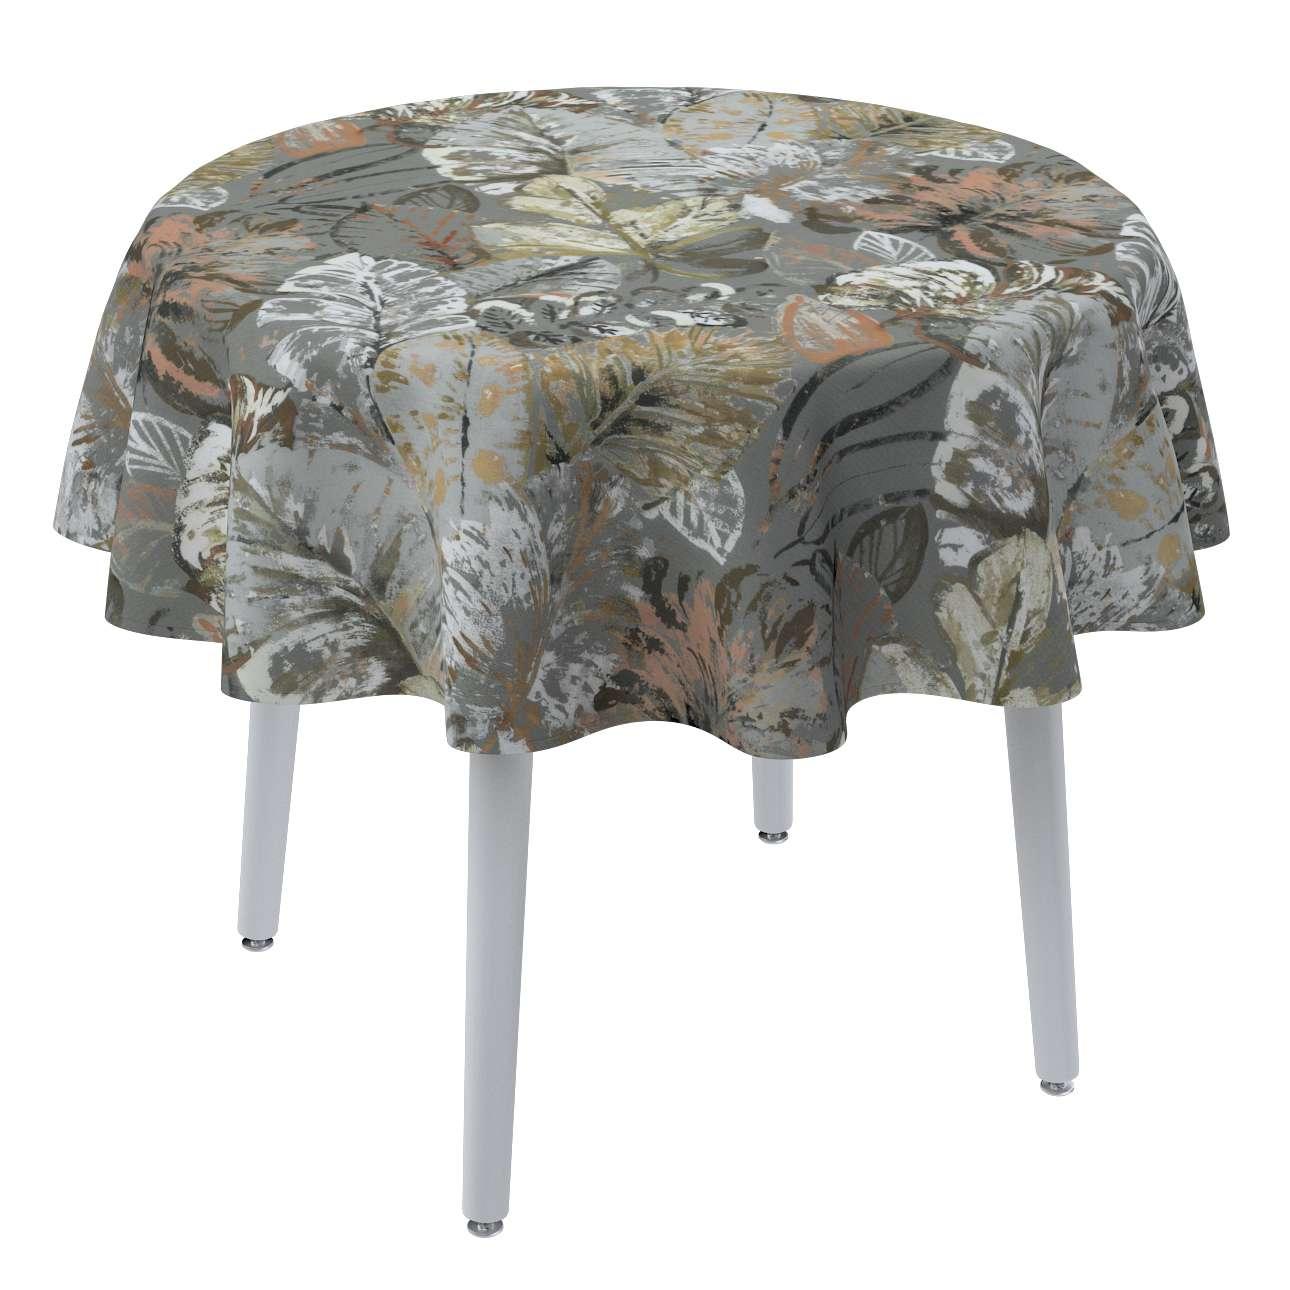 Rund bordsduk i kollektionen Abigail, Tyg: 143-19